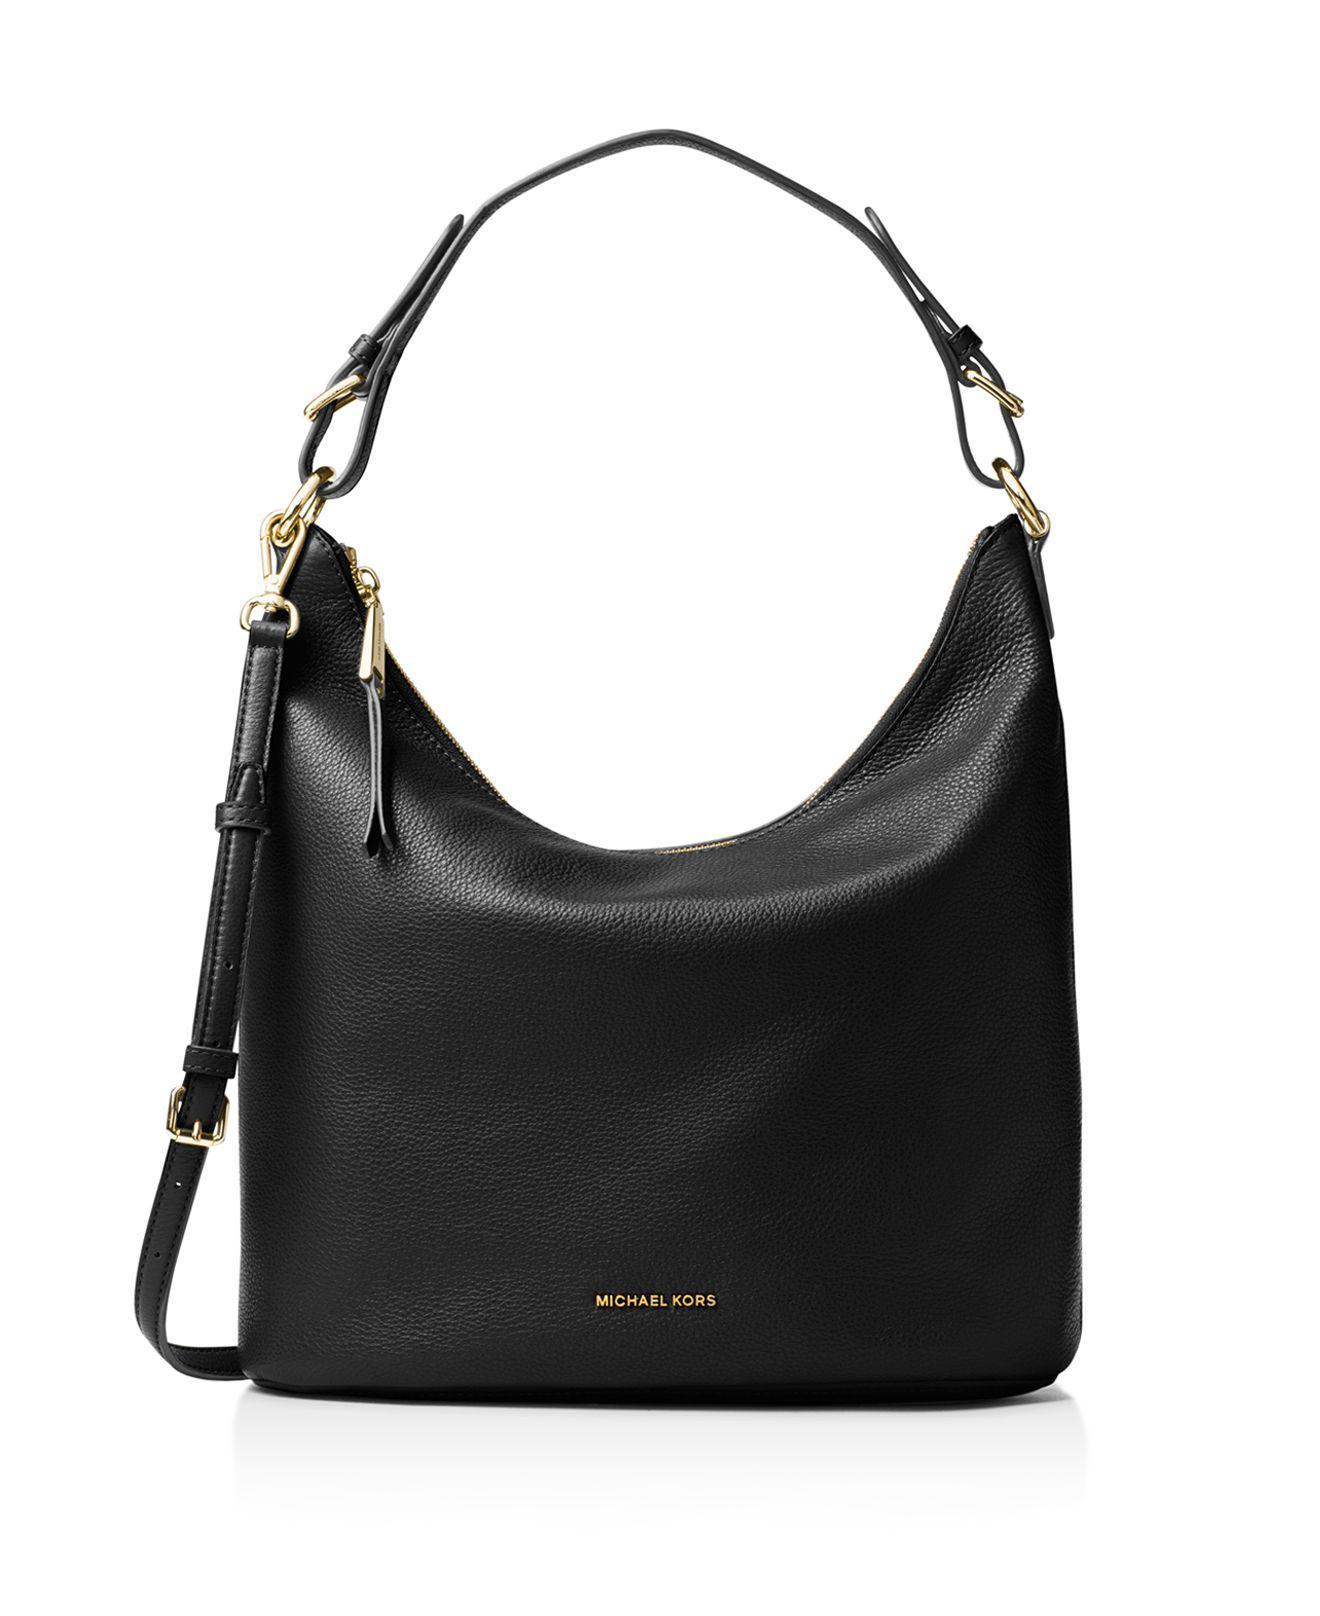 a021b39c0d74 Michael Kors Black Leather Hobo Bag | Stanford Center for ...